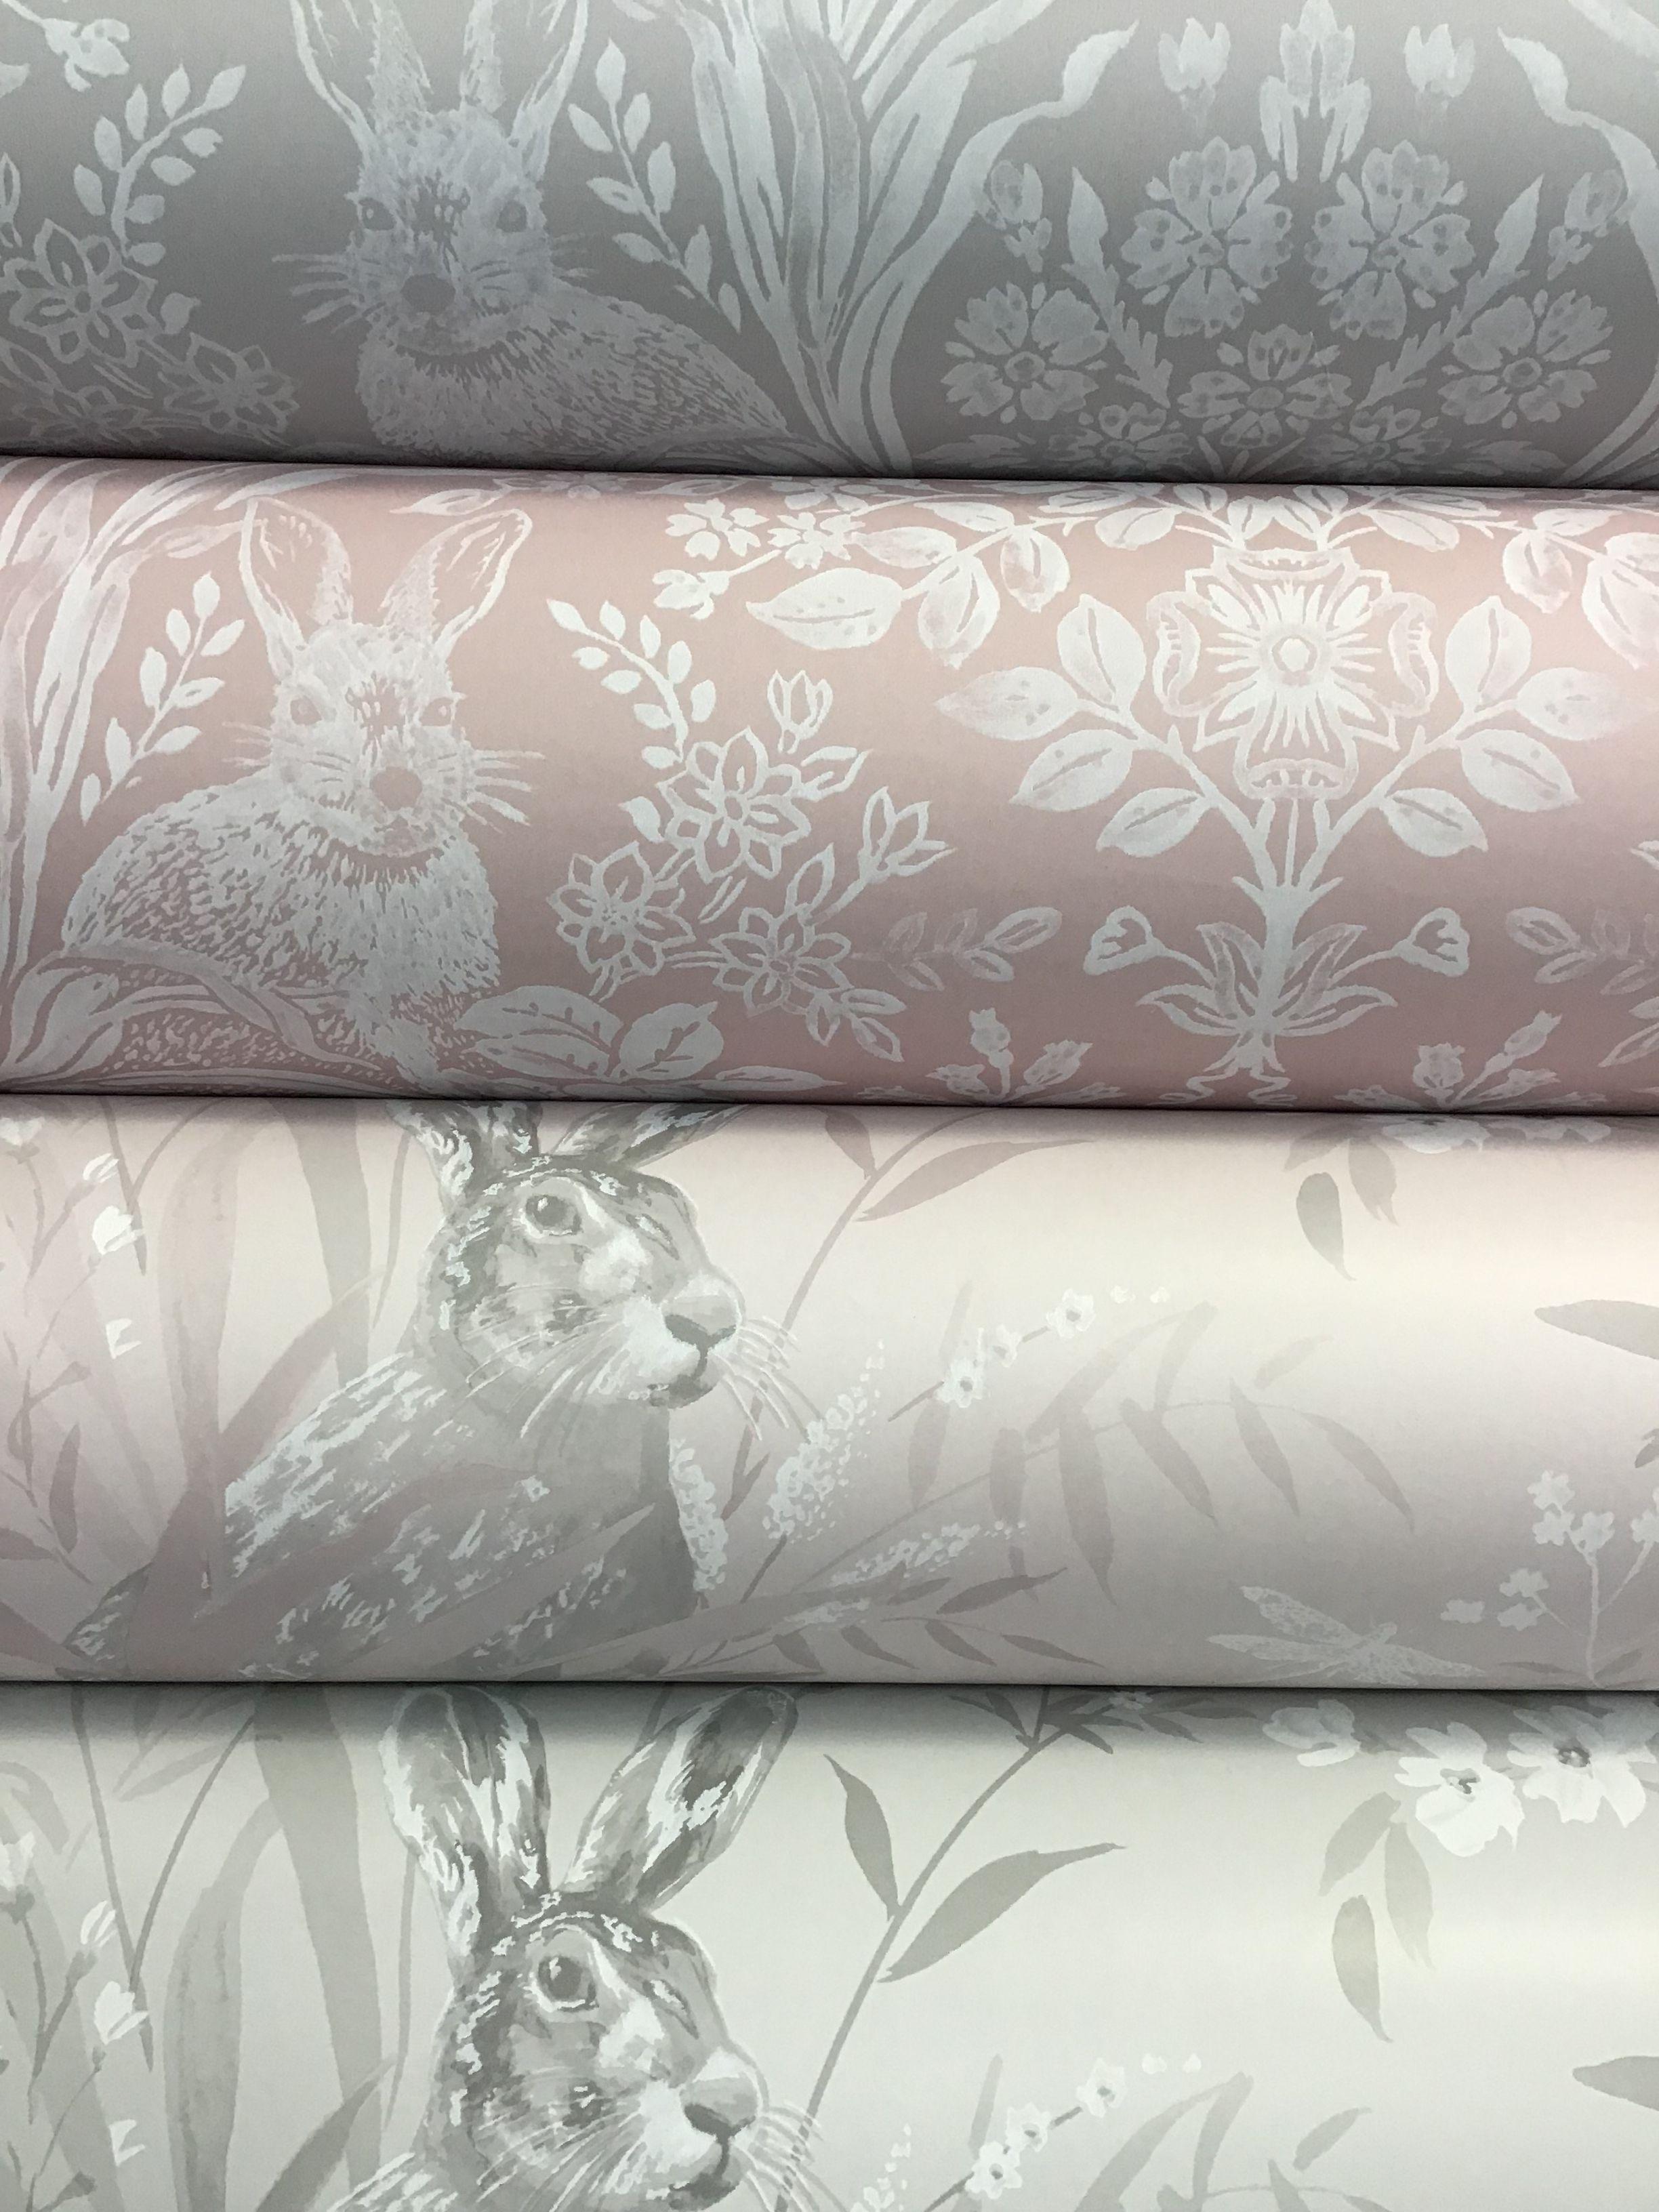 Decorating Supplies Paints Wallpaper Tools Free Shipping Decorating Centre Online Wallpaper Tools Decorating Supplies Wallpaper